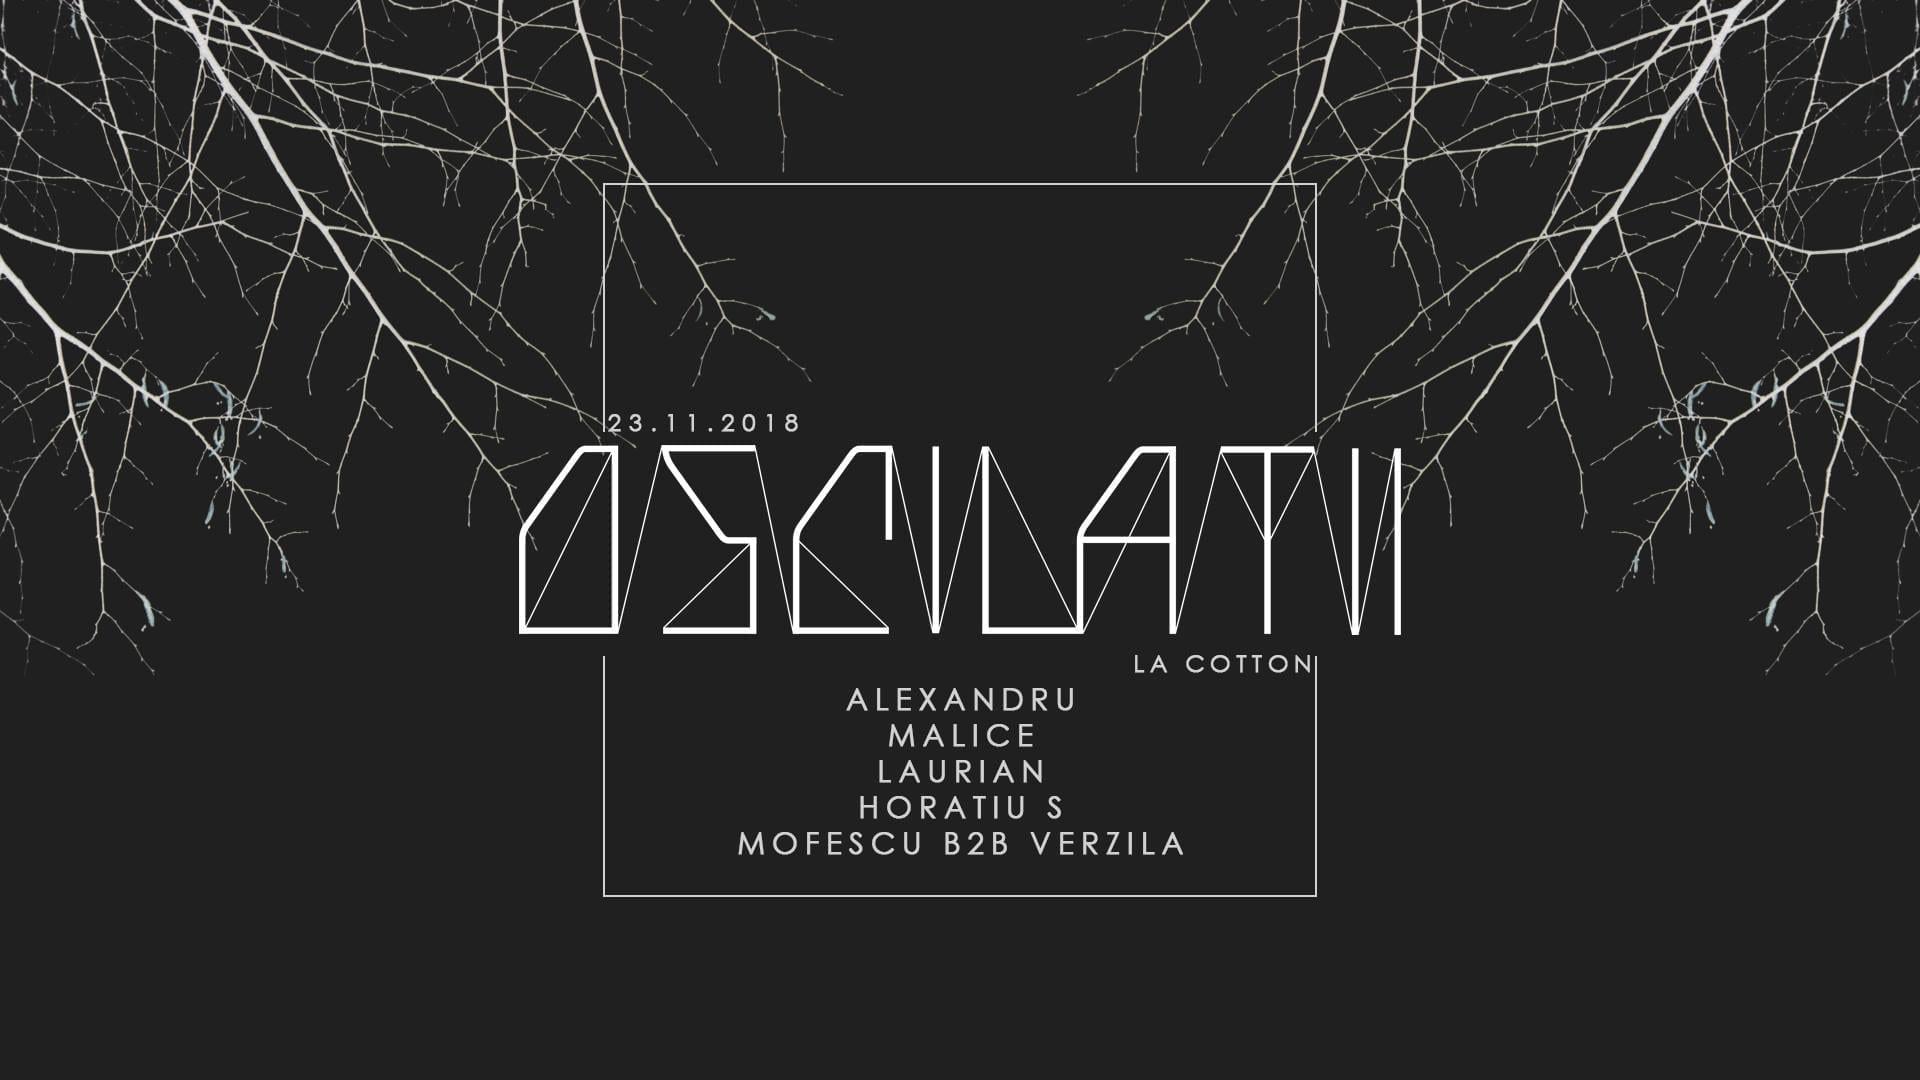 Oscilatii La Cotton